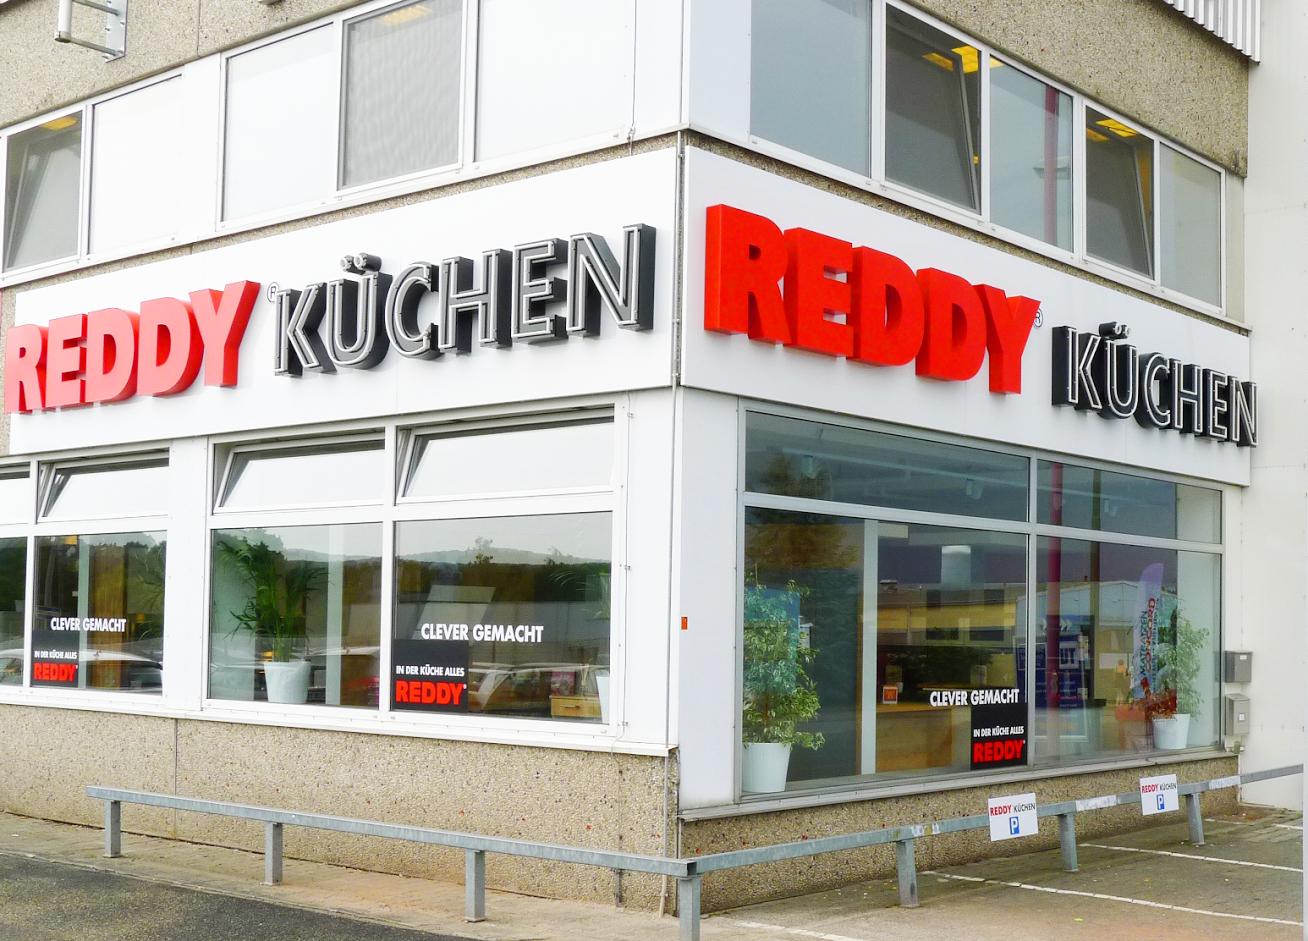 Haus garten kuchen in kaiserslautern infobel deutschland for Küchen kaiserslautern